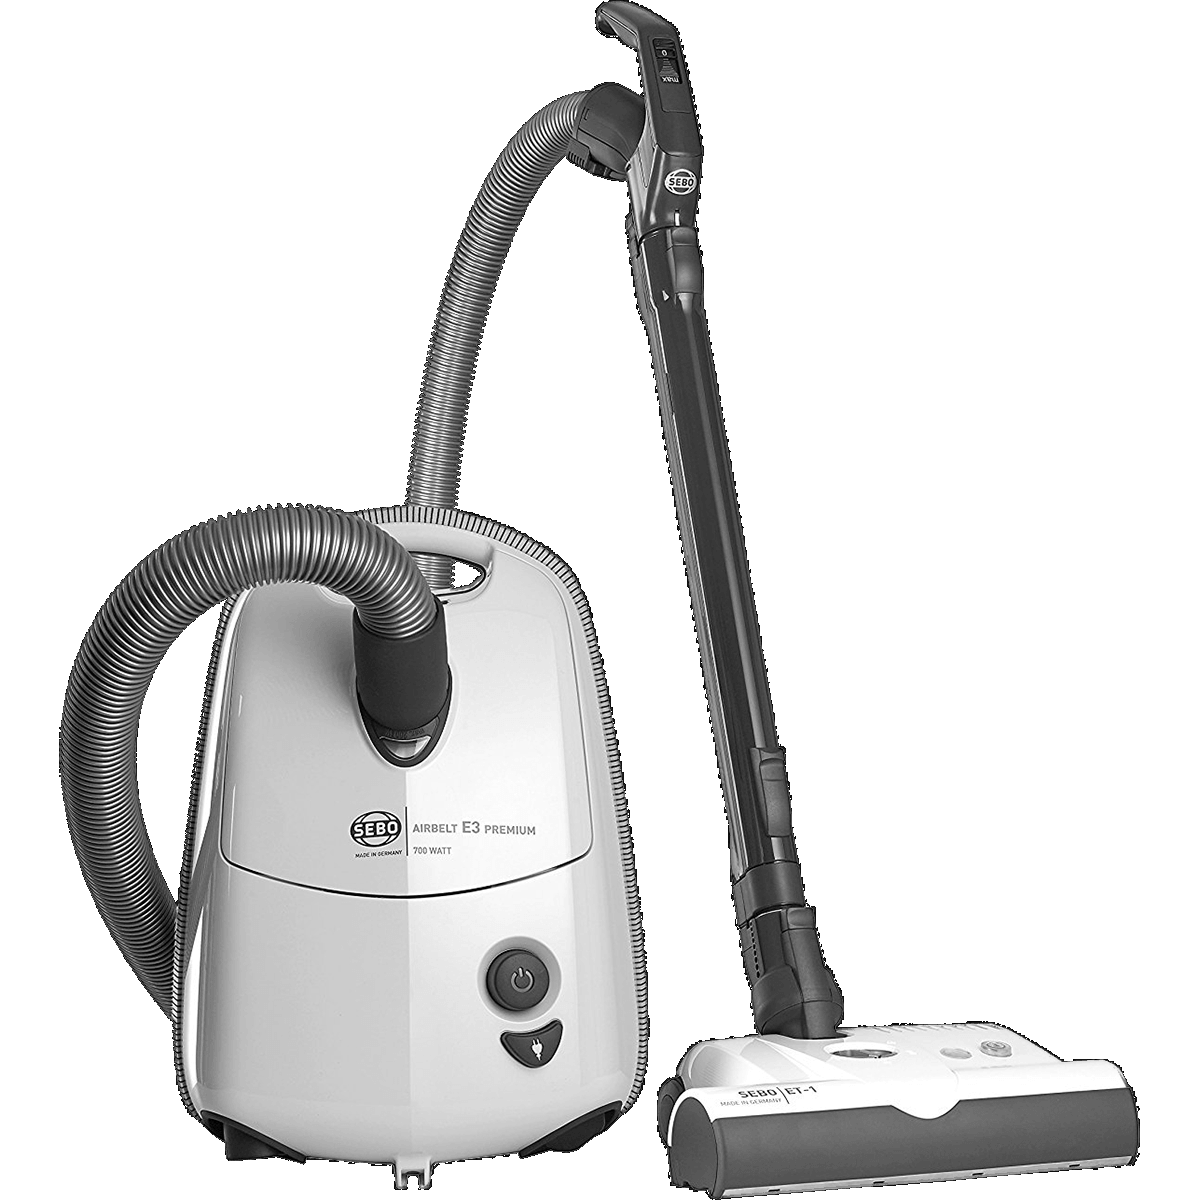 Sebo AIRBELT E3 Premium Canister Vacuum